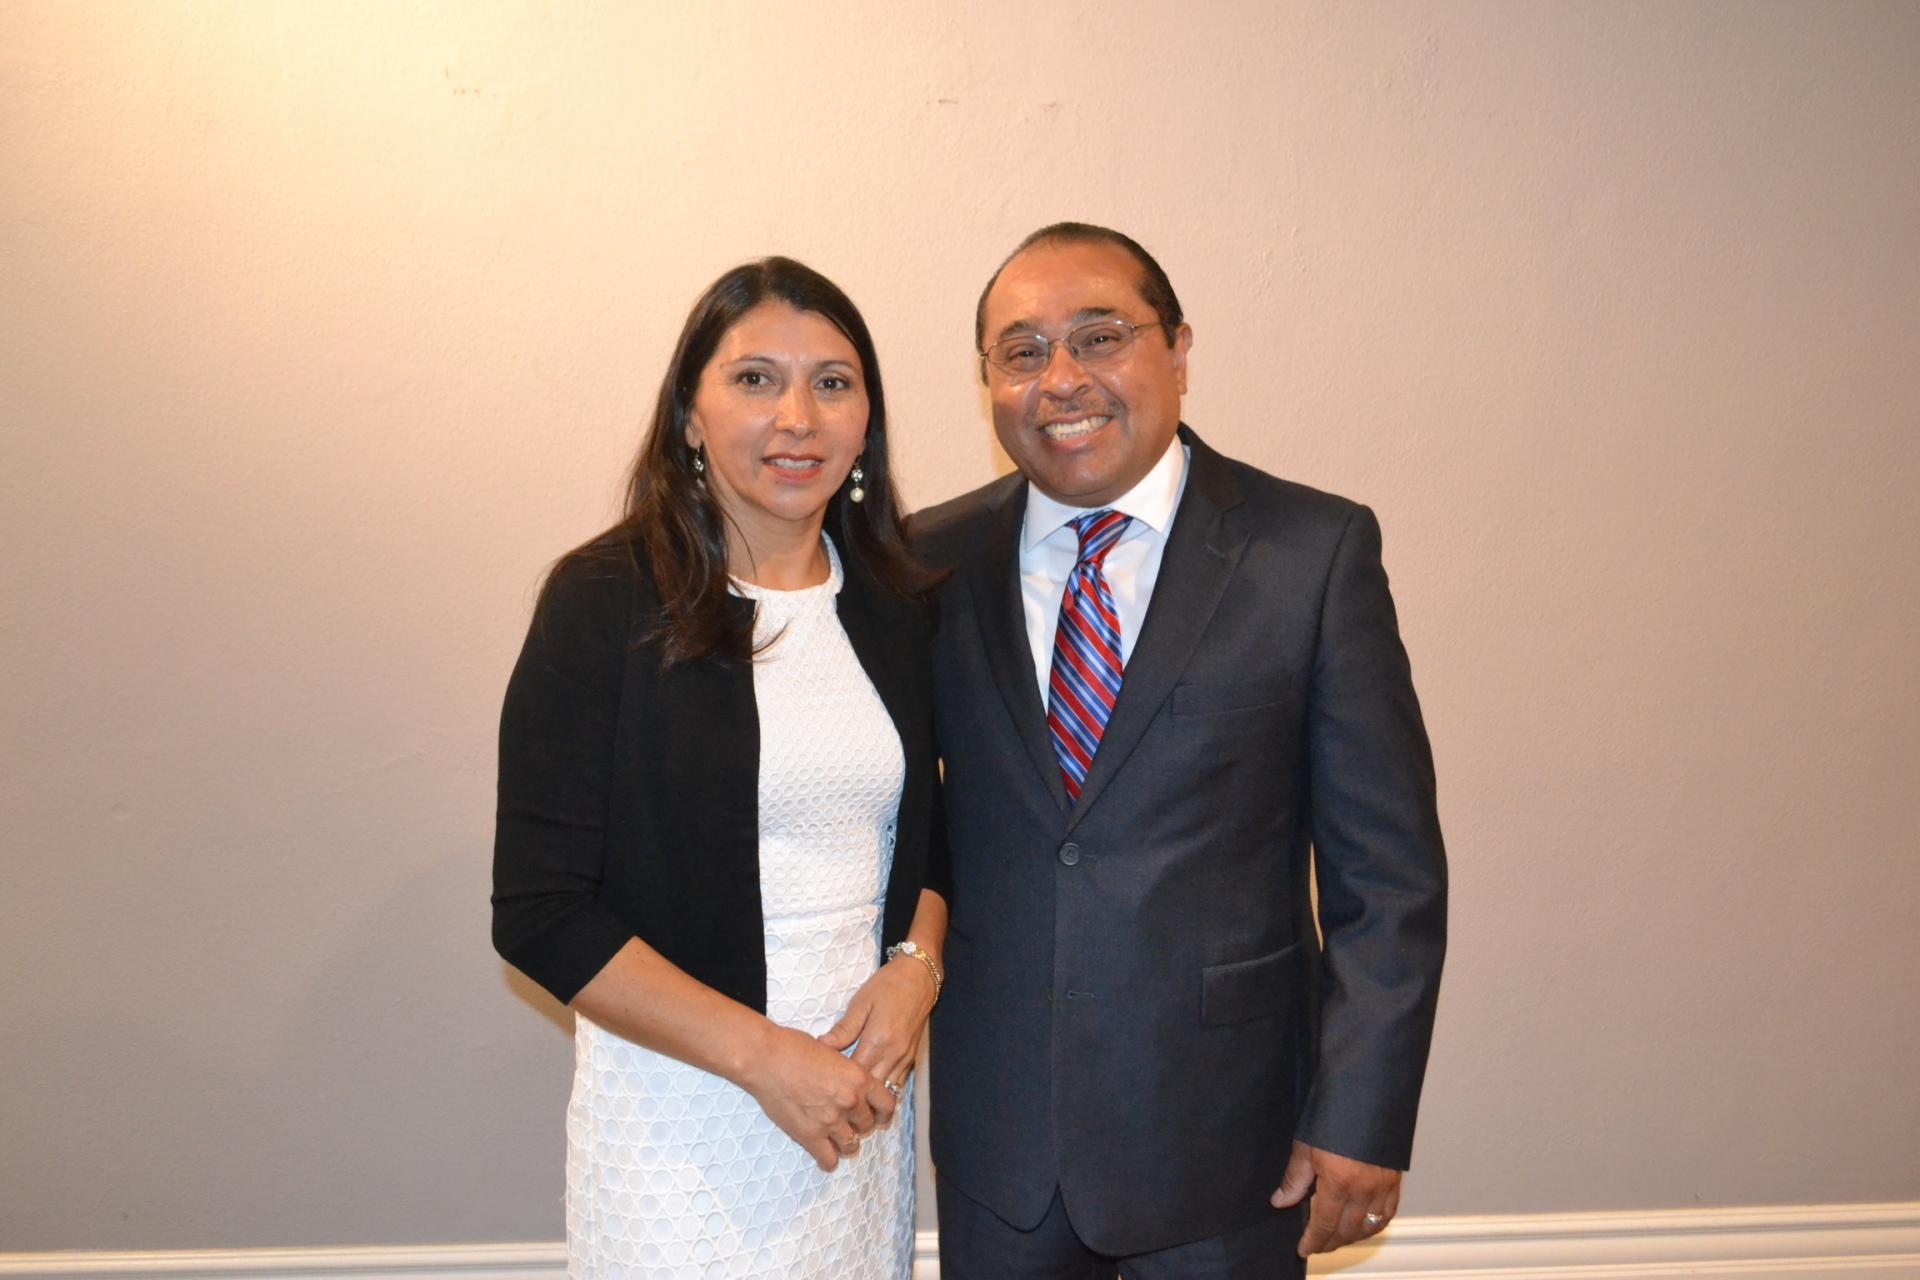 Manuel Alvarez & Rosemery Alvarez  Pastores Asistentes